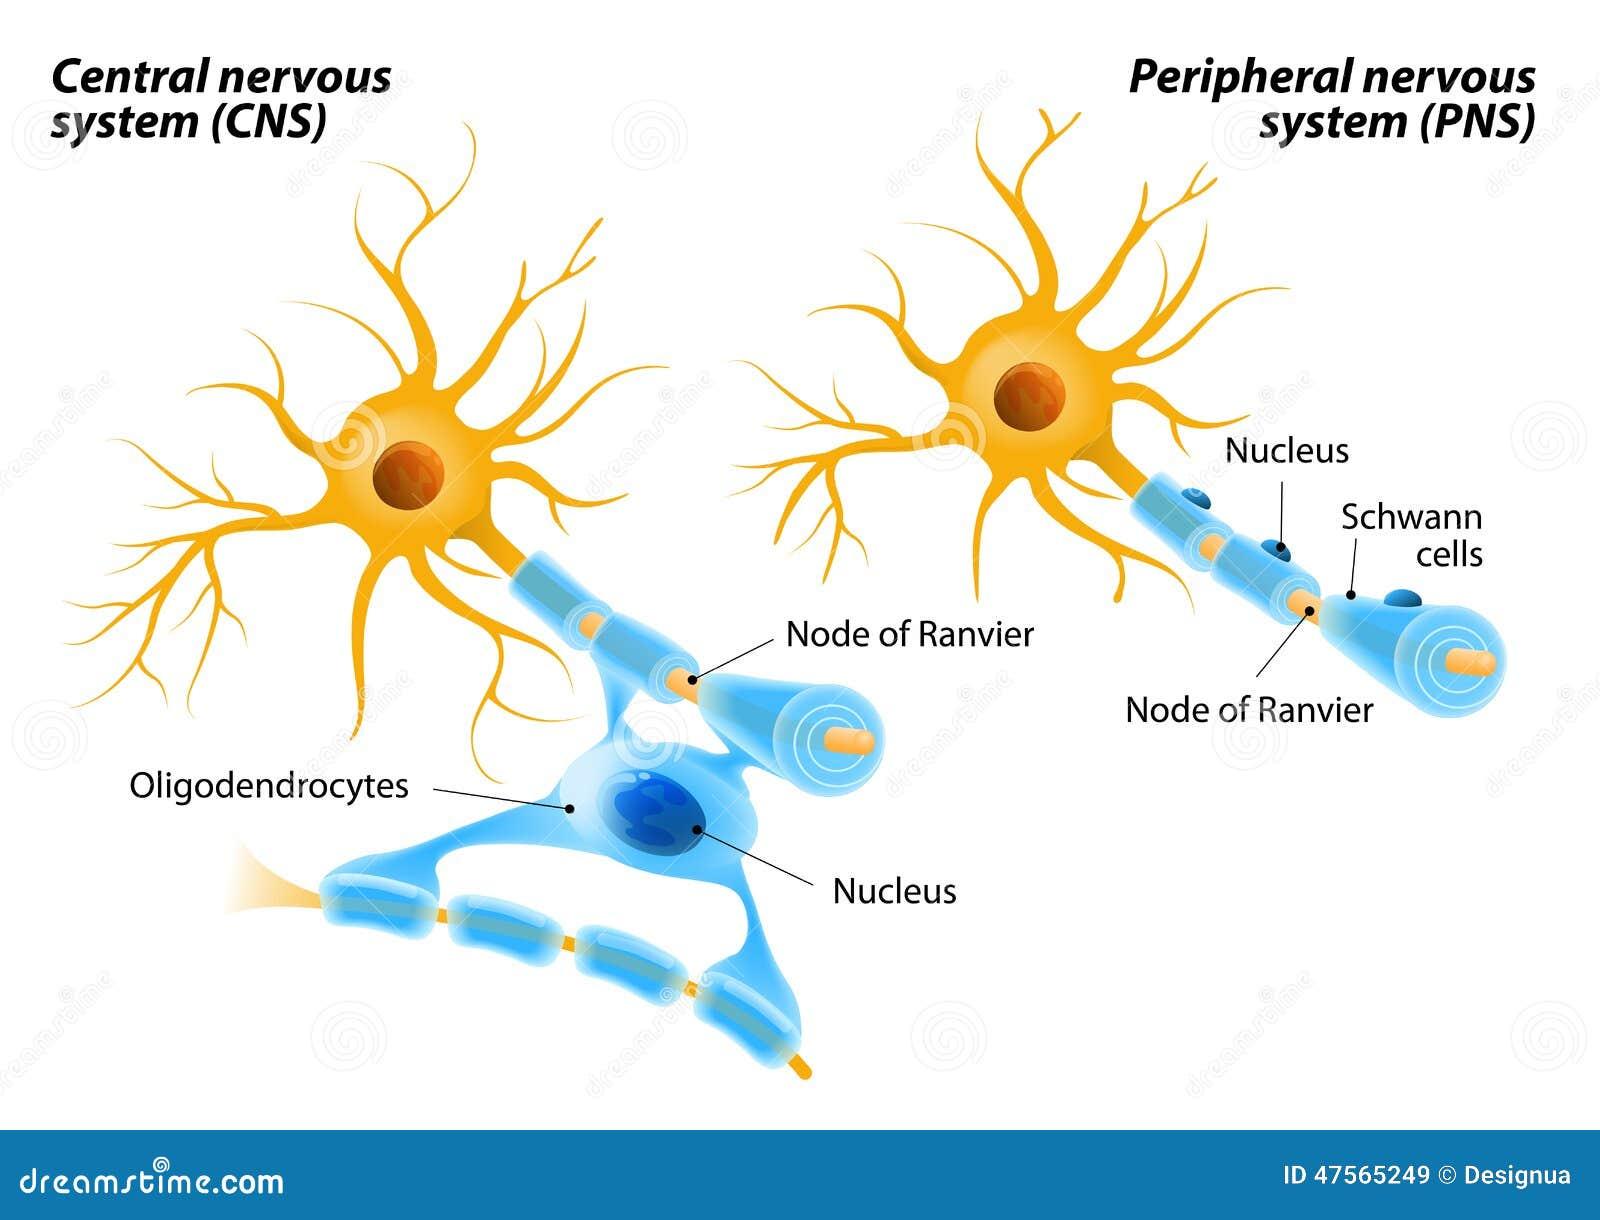 Cellules de Schwann et Oligodendrocytes